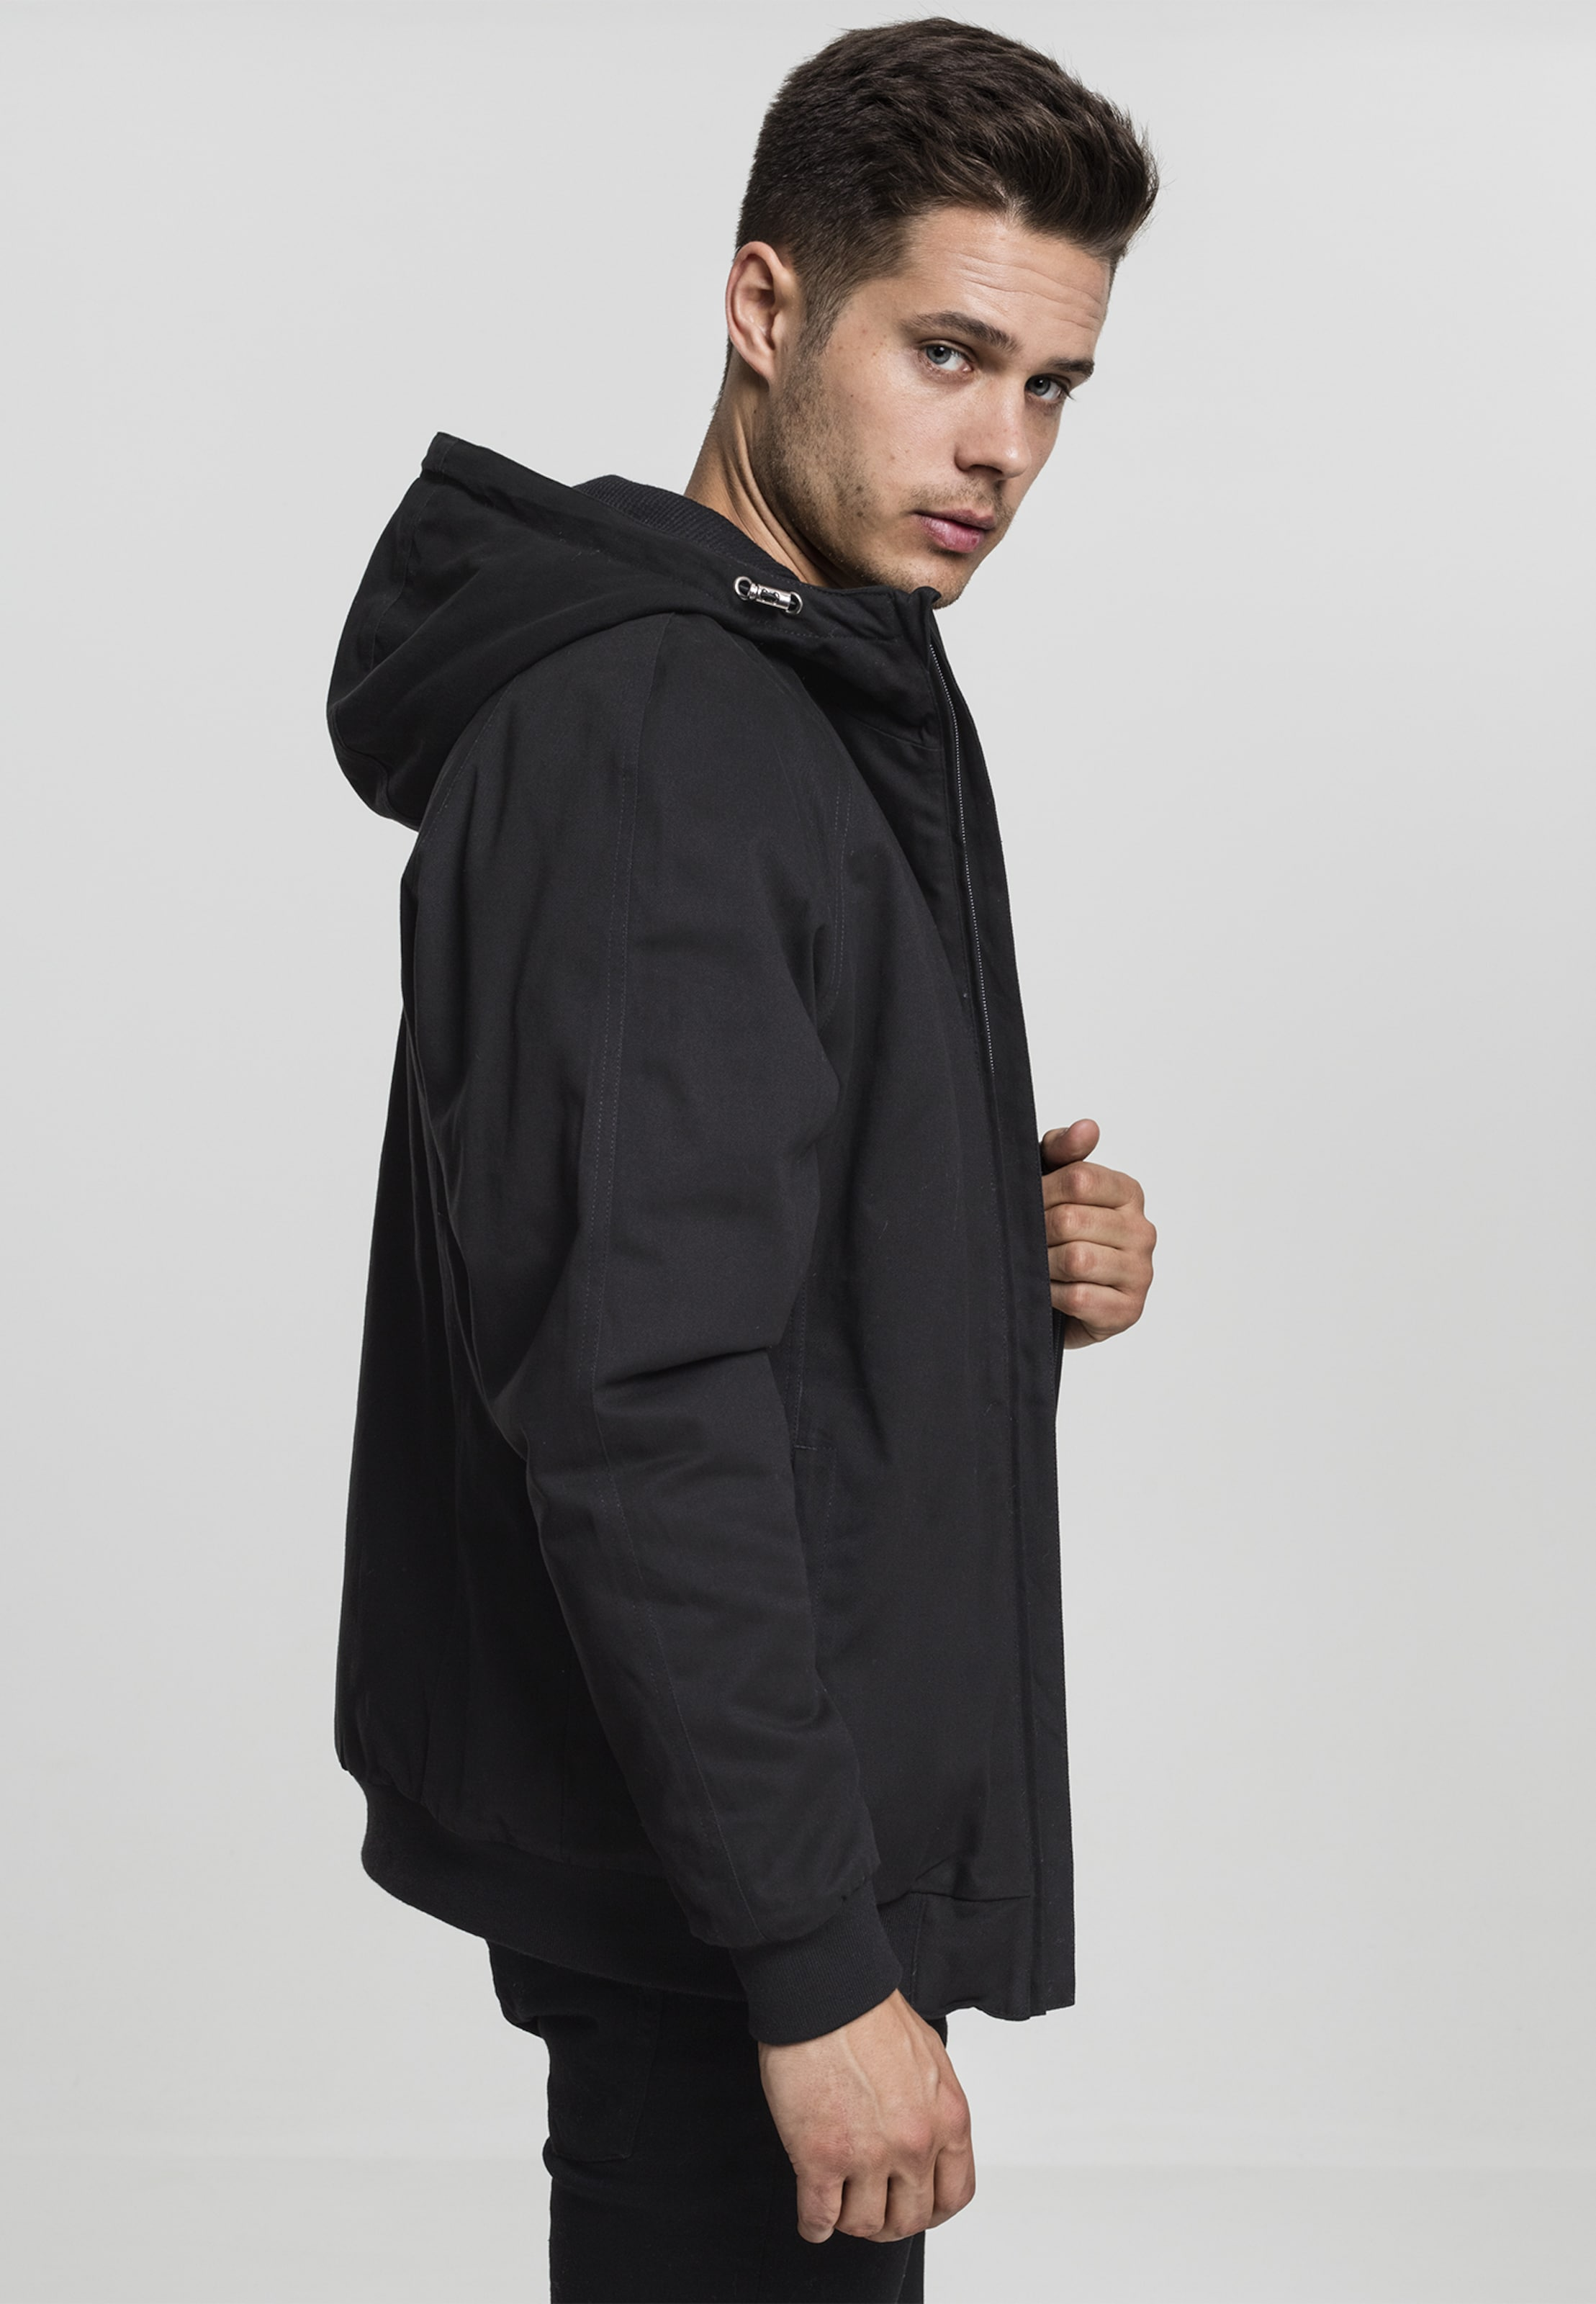 In Jacket Schwarz Classics Urban Hooded ynw80OvNm